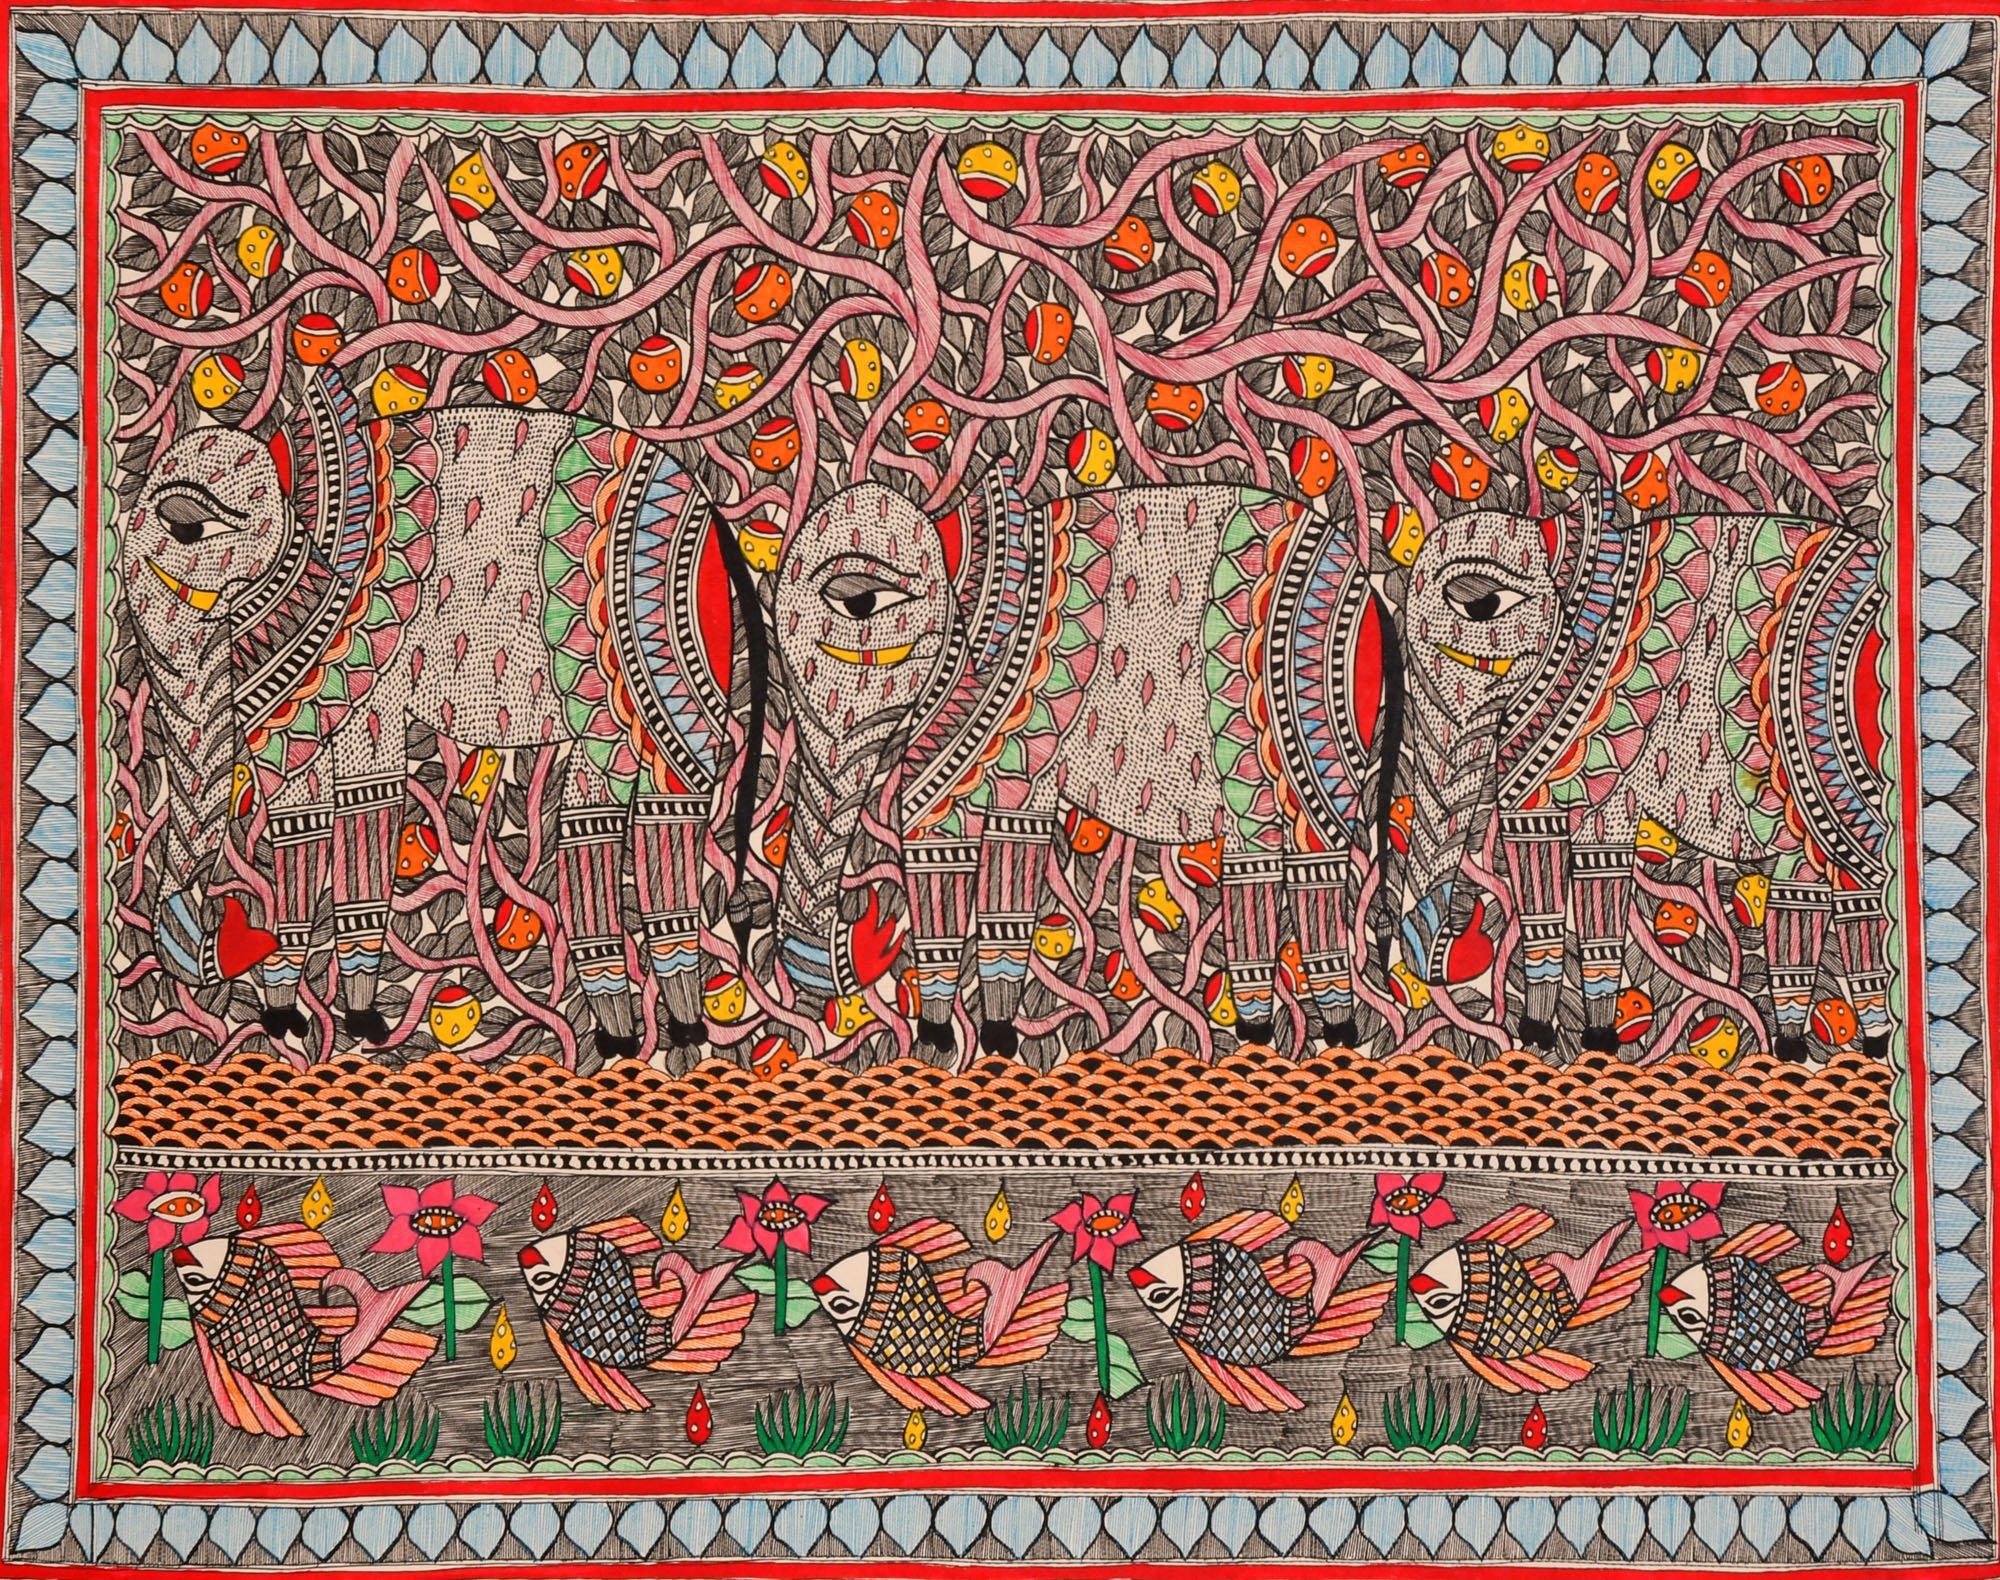 Elephants and Fishes - Madhubani Painting on Hand Made Paper - Folk Painting